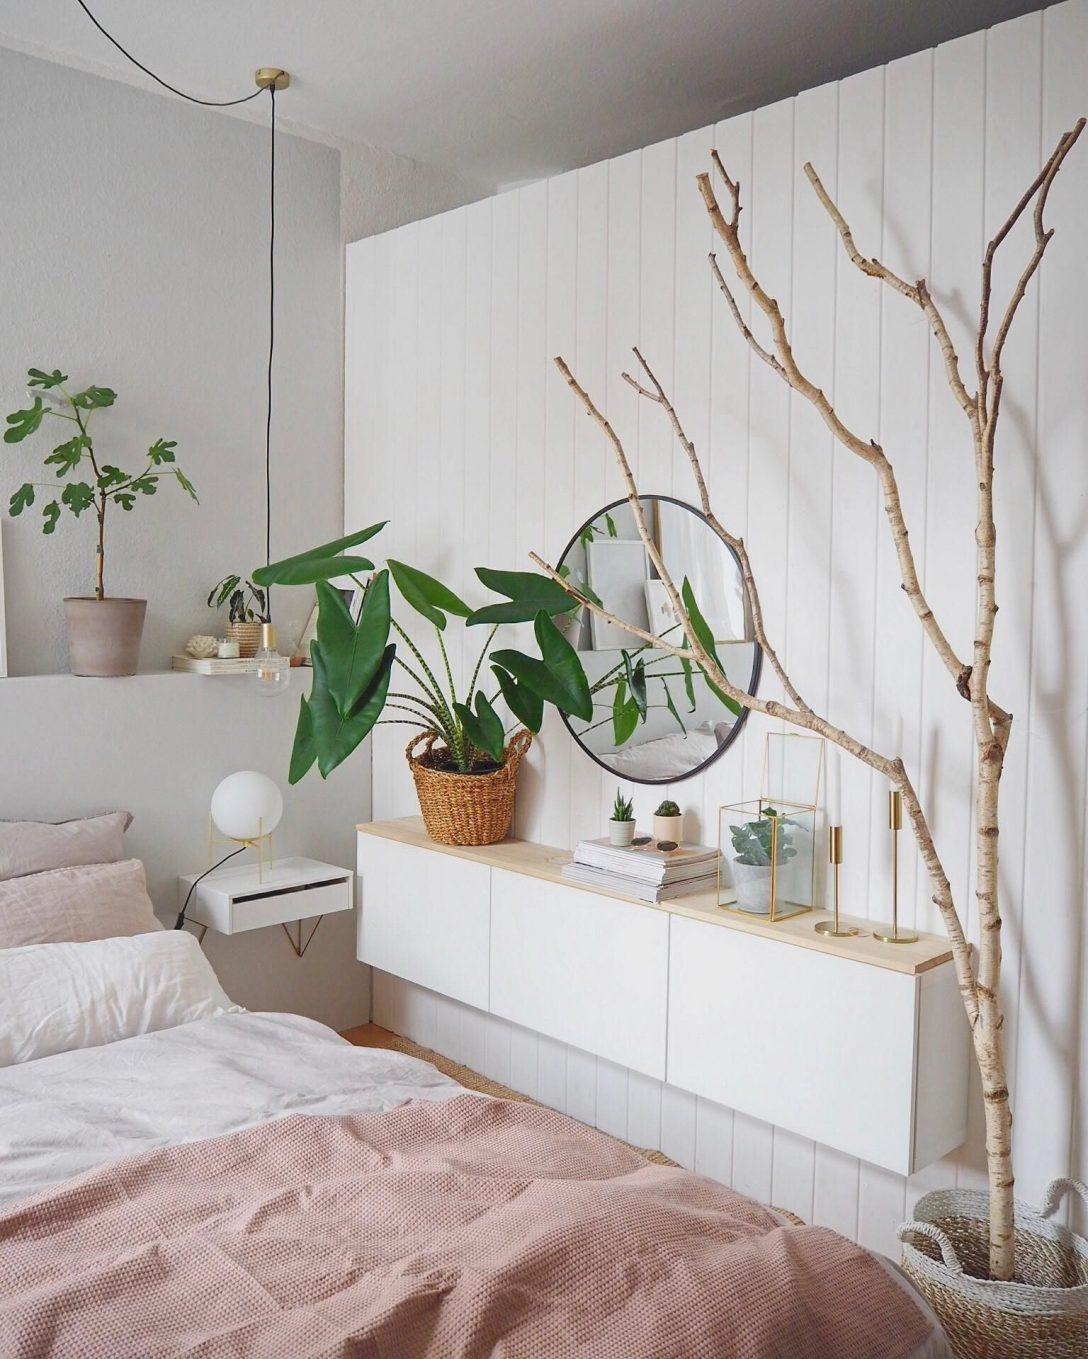 Full Size of Wanddeko Ideen Schlafzimmer Deko Grau Rosa Dekorieren Pinterest Bad Renovieren Küche Wohnzimmer Tapeten Wohnzimmer Wanddeko Ideen